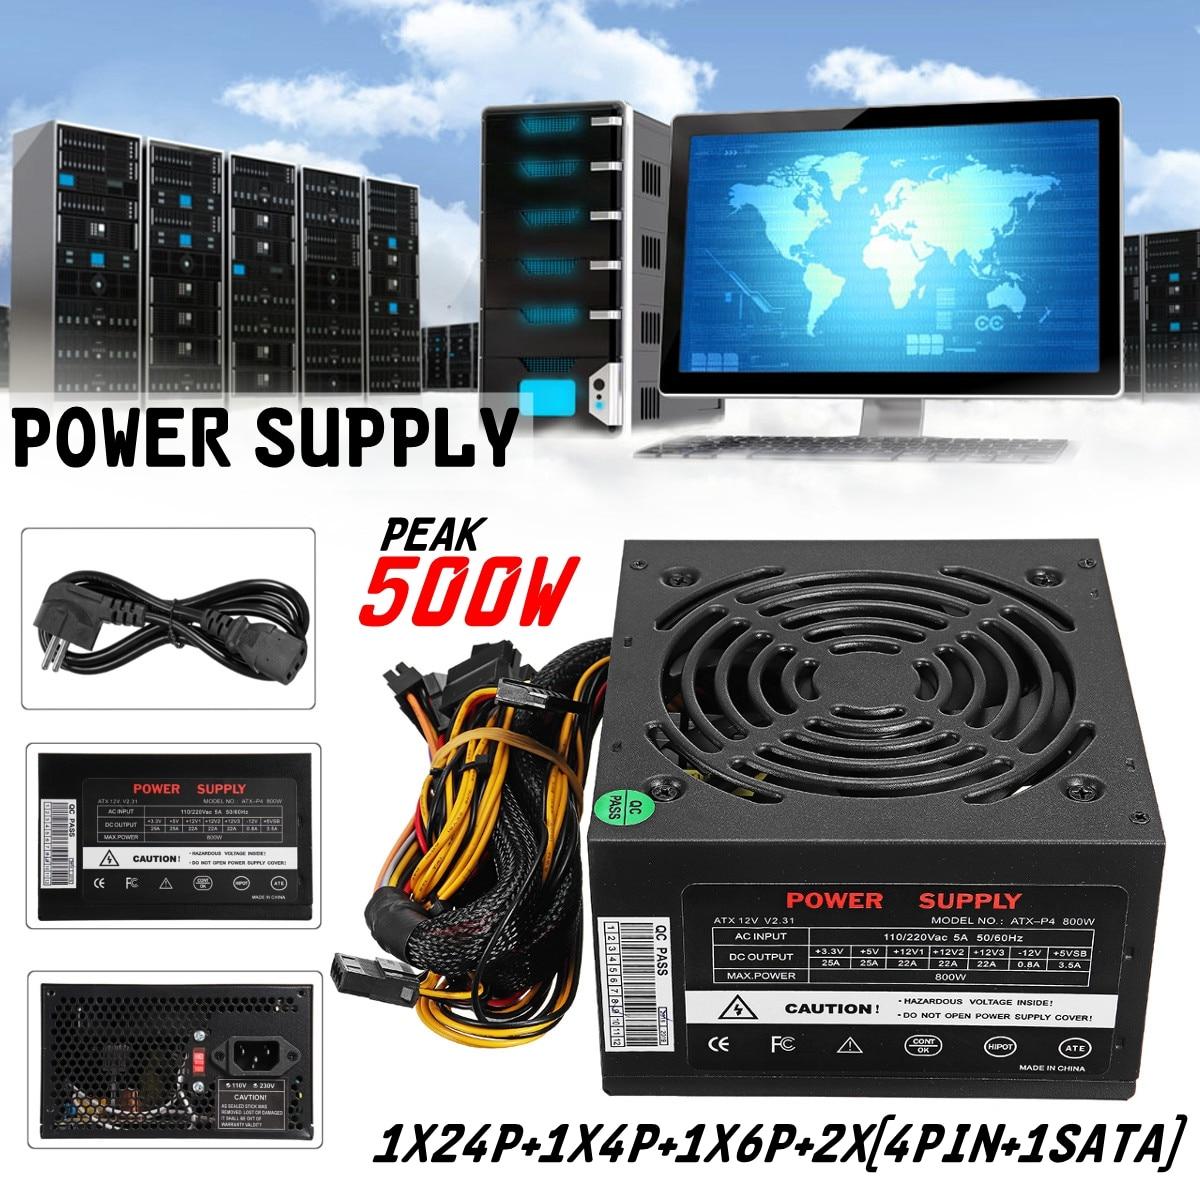 Black Max 500W PSU /PFC/ATX 24Pin SATA Gaming PC Power Supply For Intel AMD Computer Power Supply 400w mini chassis pc power supply 110v atx power supply pc computer power supply gaming psu 12v active pfc 24pin max 500w diy pc